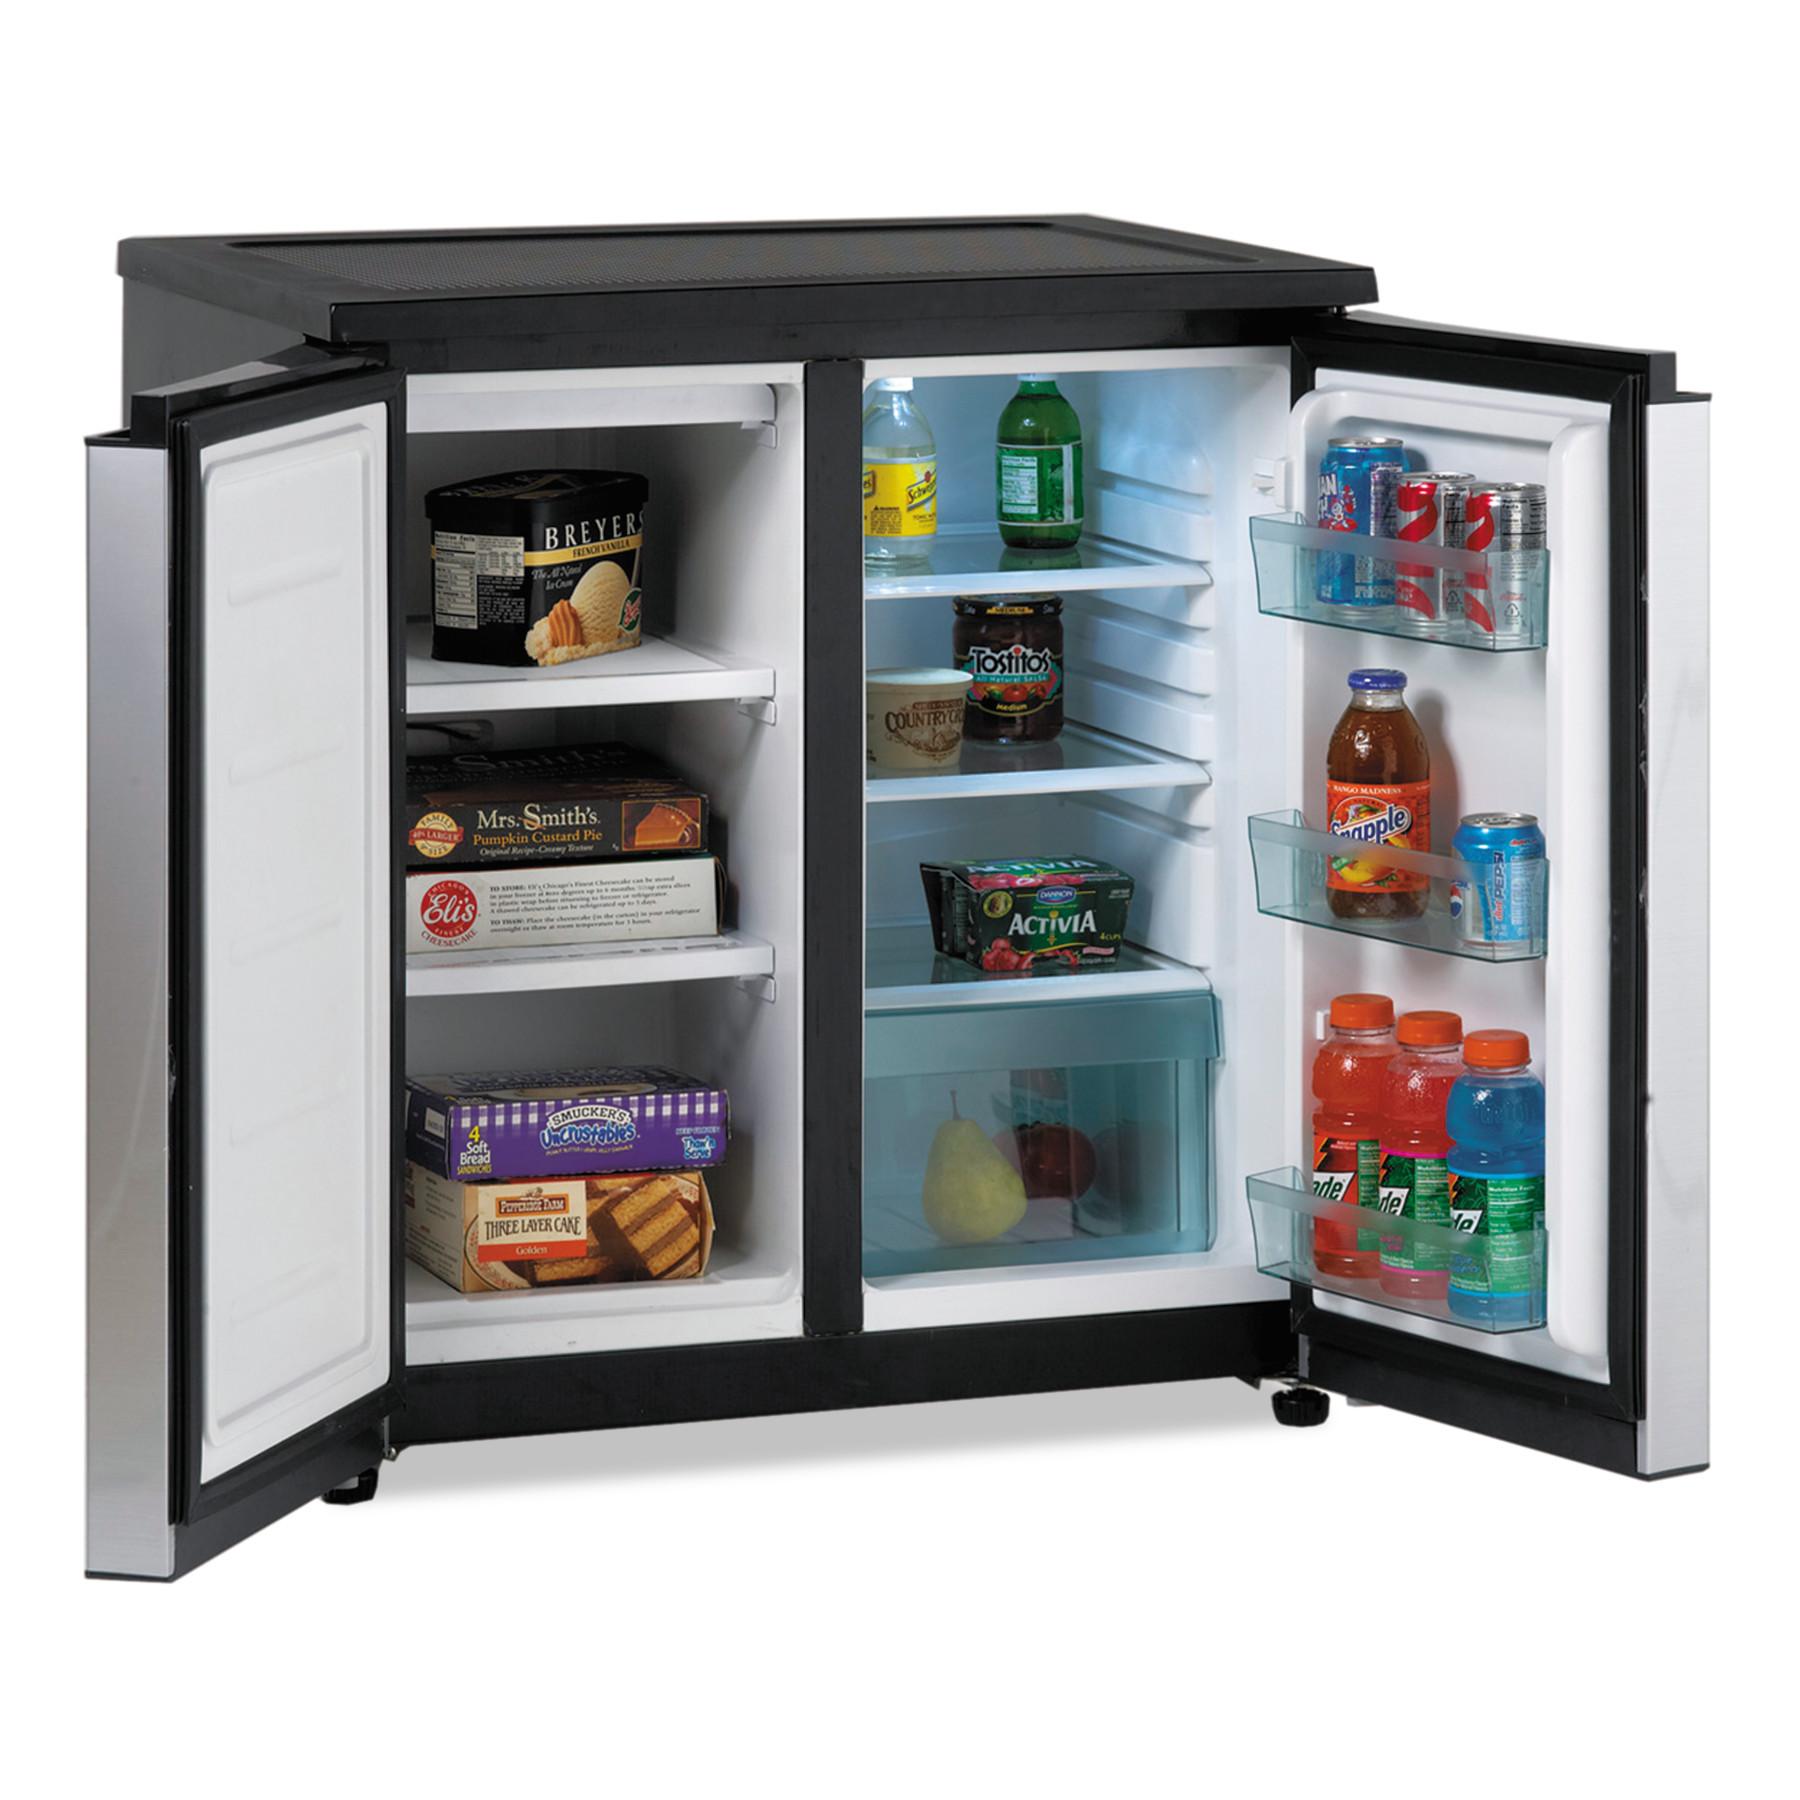 Avanti 5.5 CF Side by Side Refrigerator/Freezer, Black/Stainless Steel